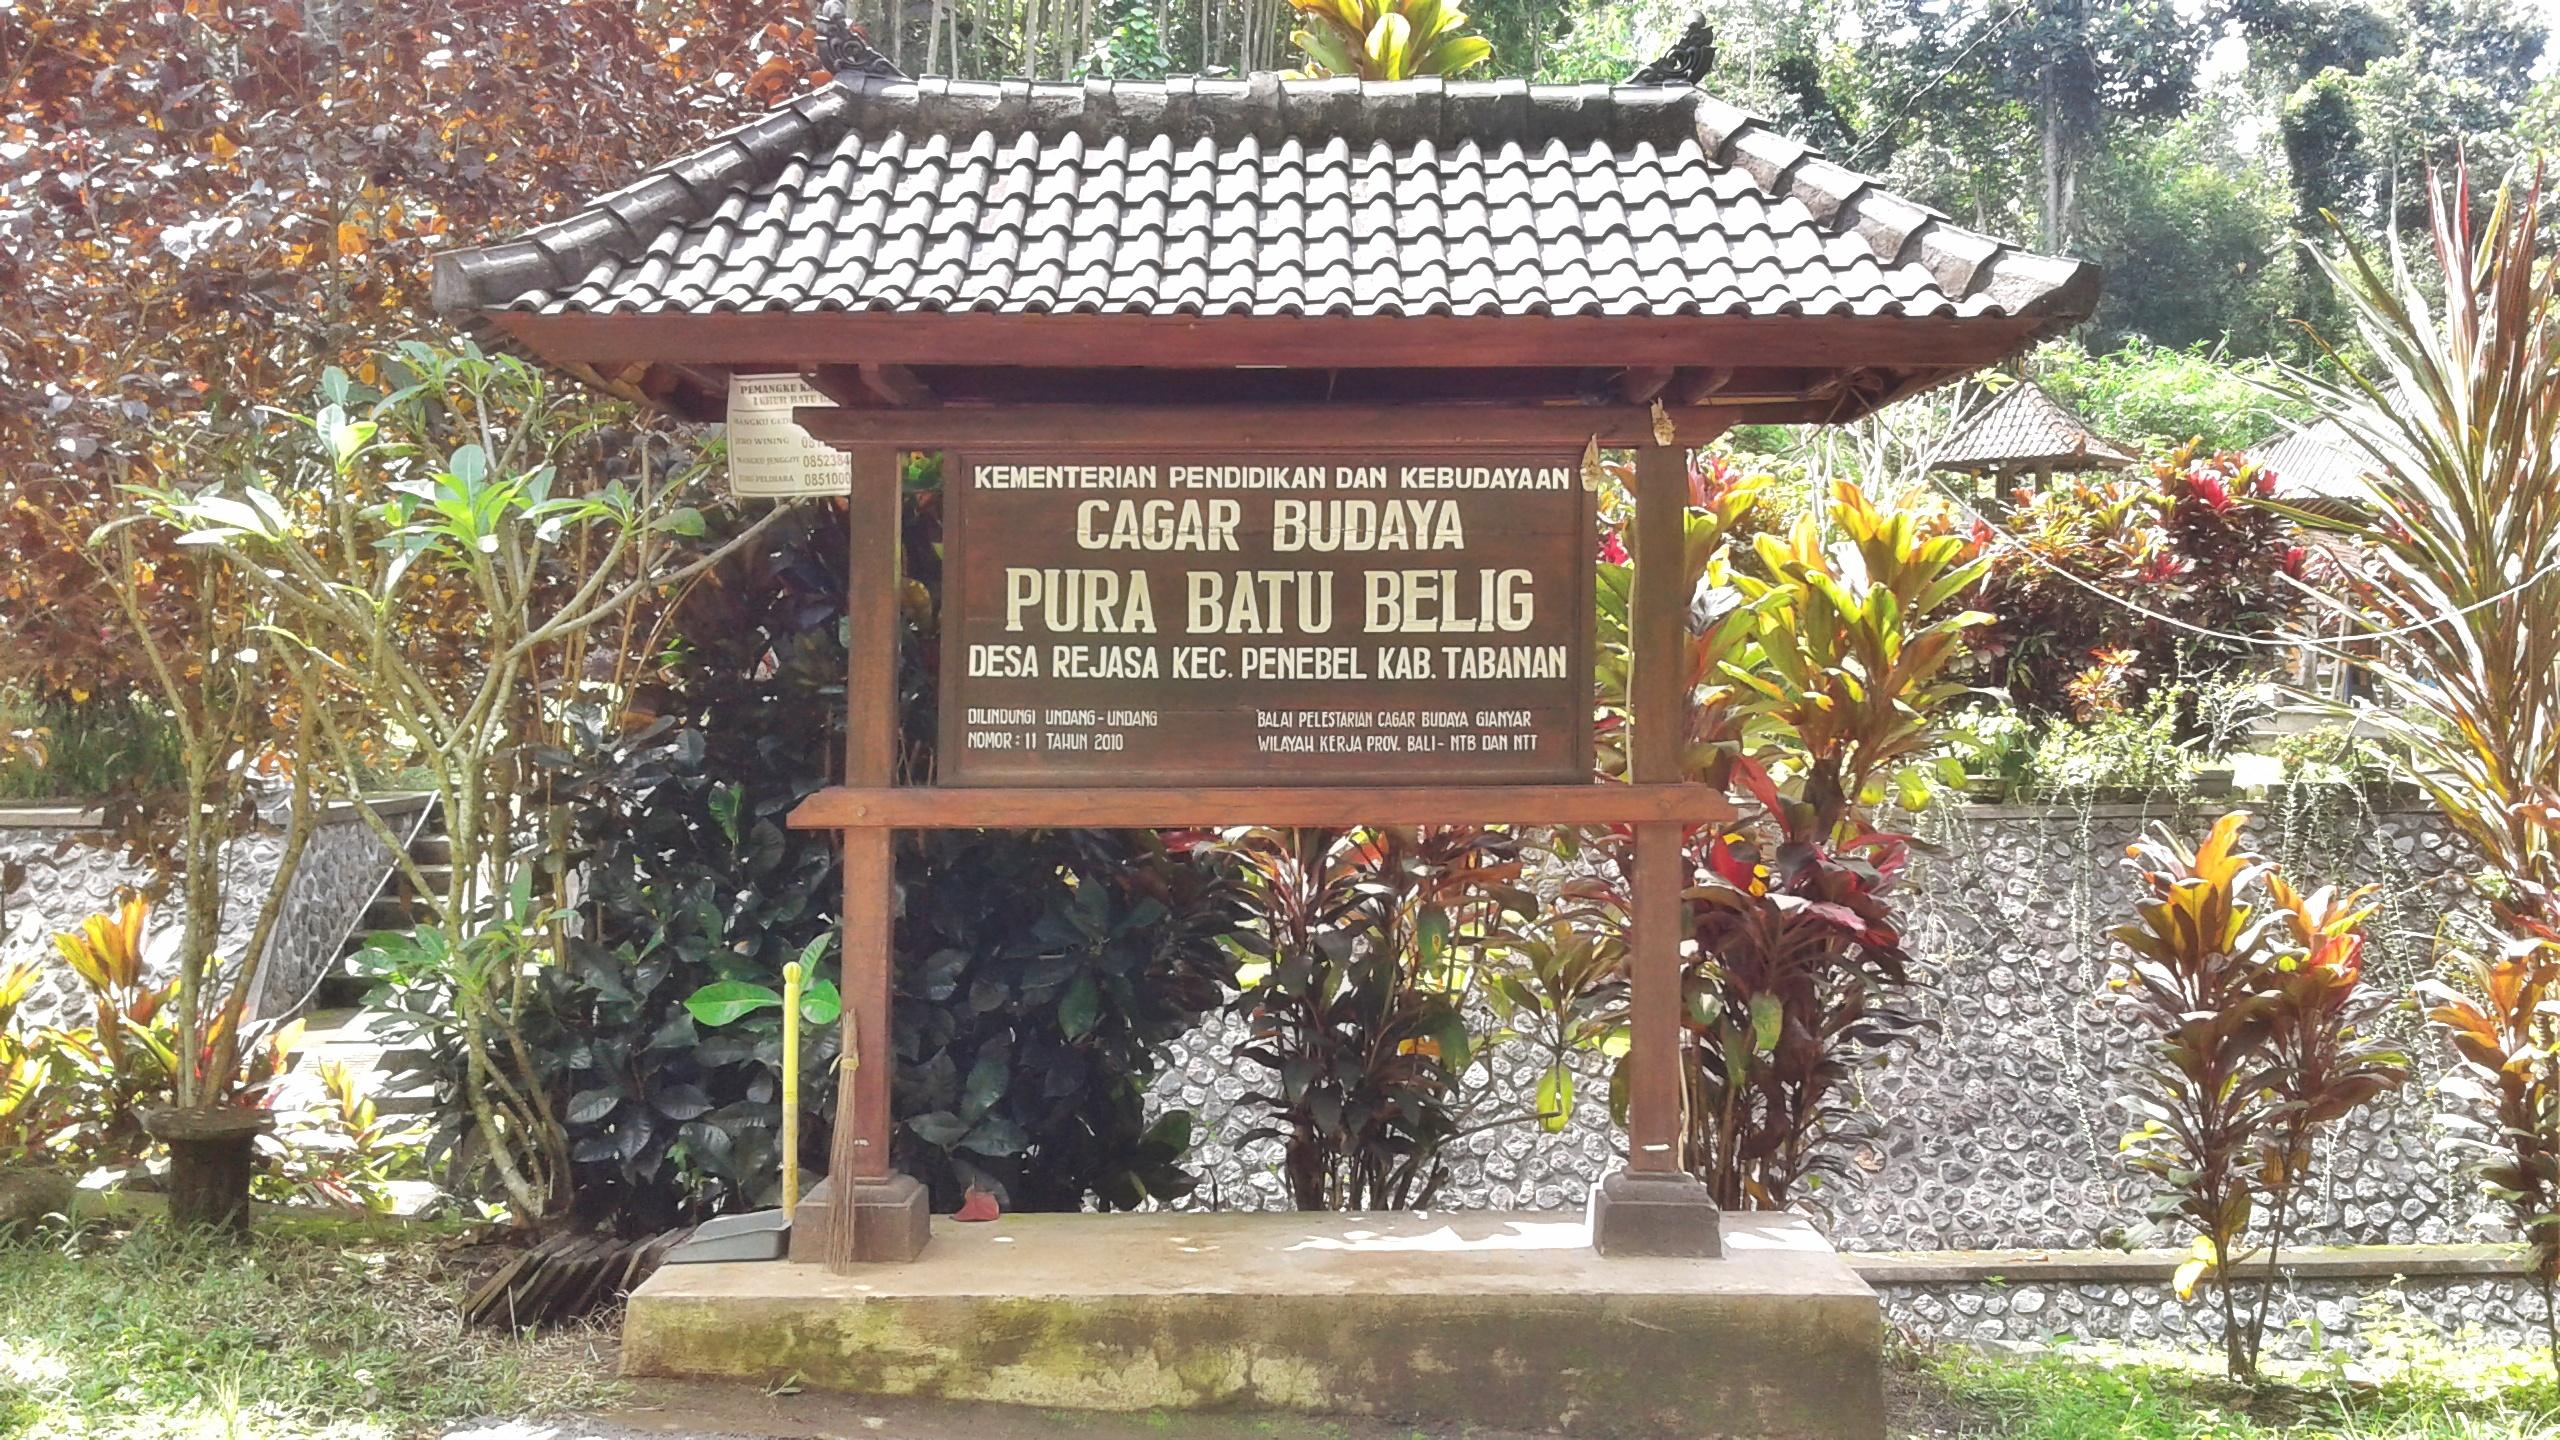 Temples Bali Quick Rundown 9 Visit Photo Courtesy Thekencana Aryaputra